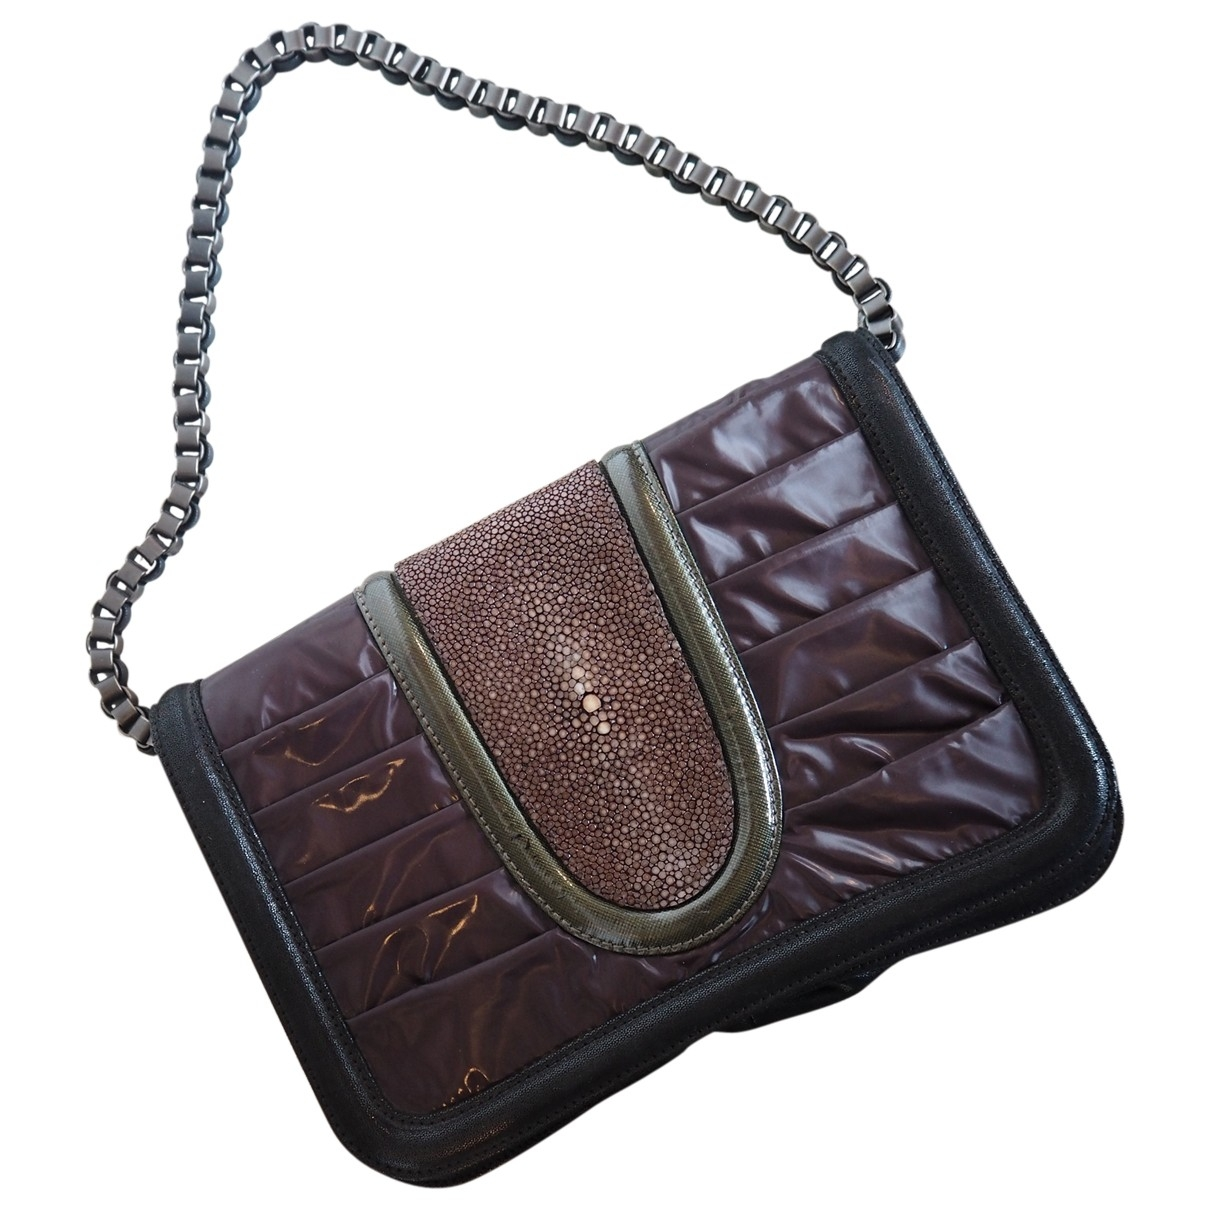 Pauric Sweeney \N Burgundy Stingray handbag for Women \N